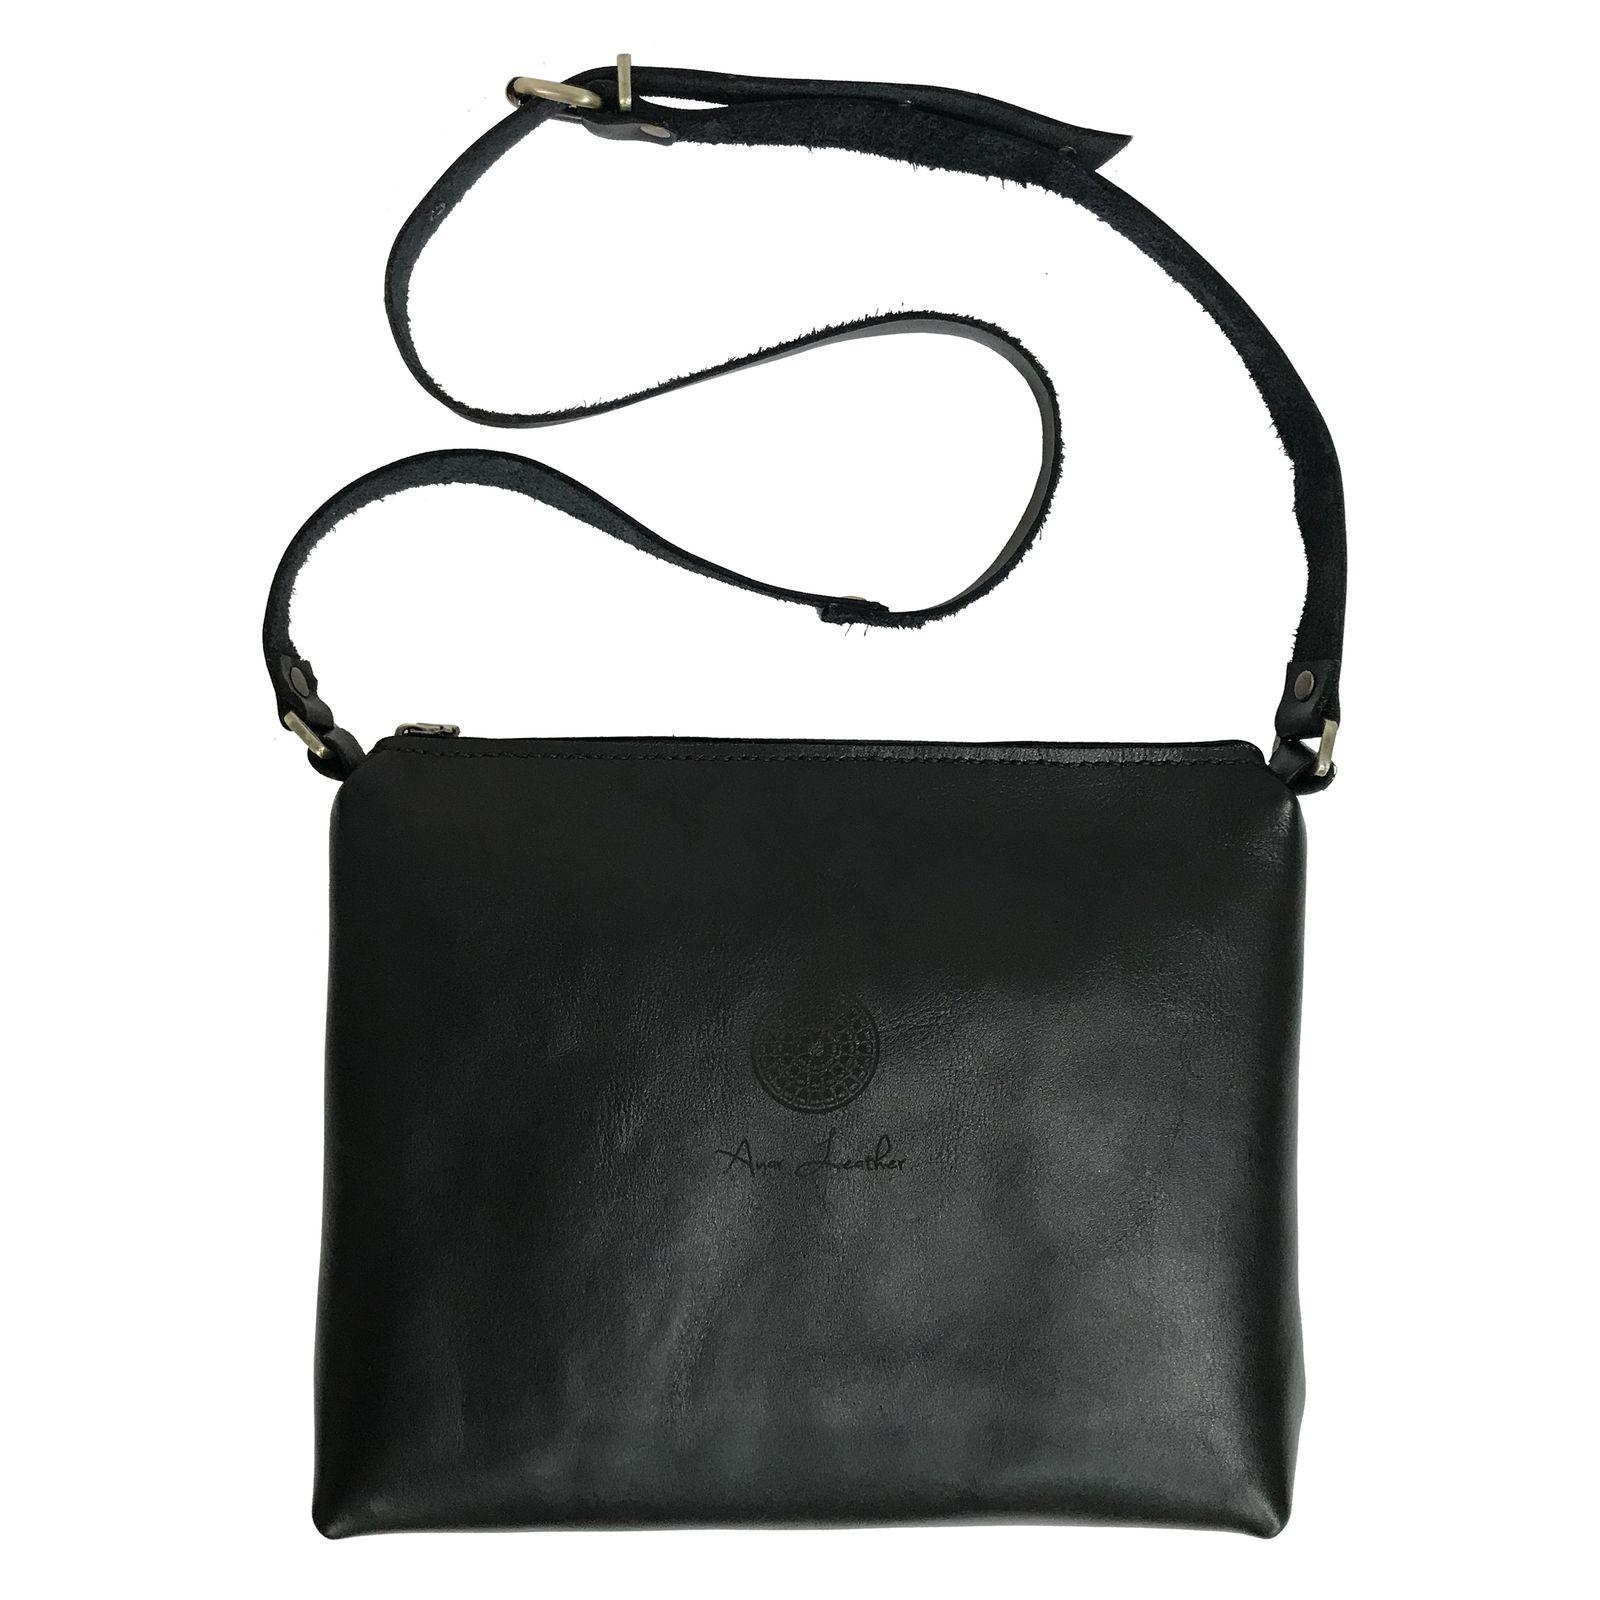 کیف رو دوشی انارلدر مدل لاگون پلاس -  - 3